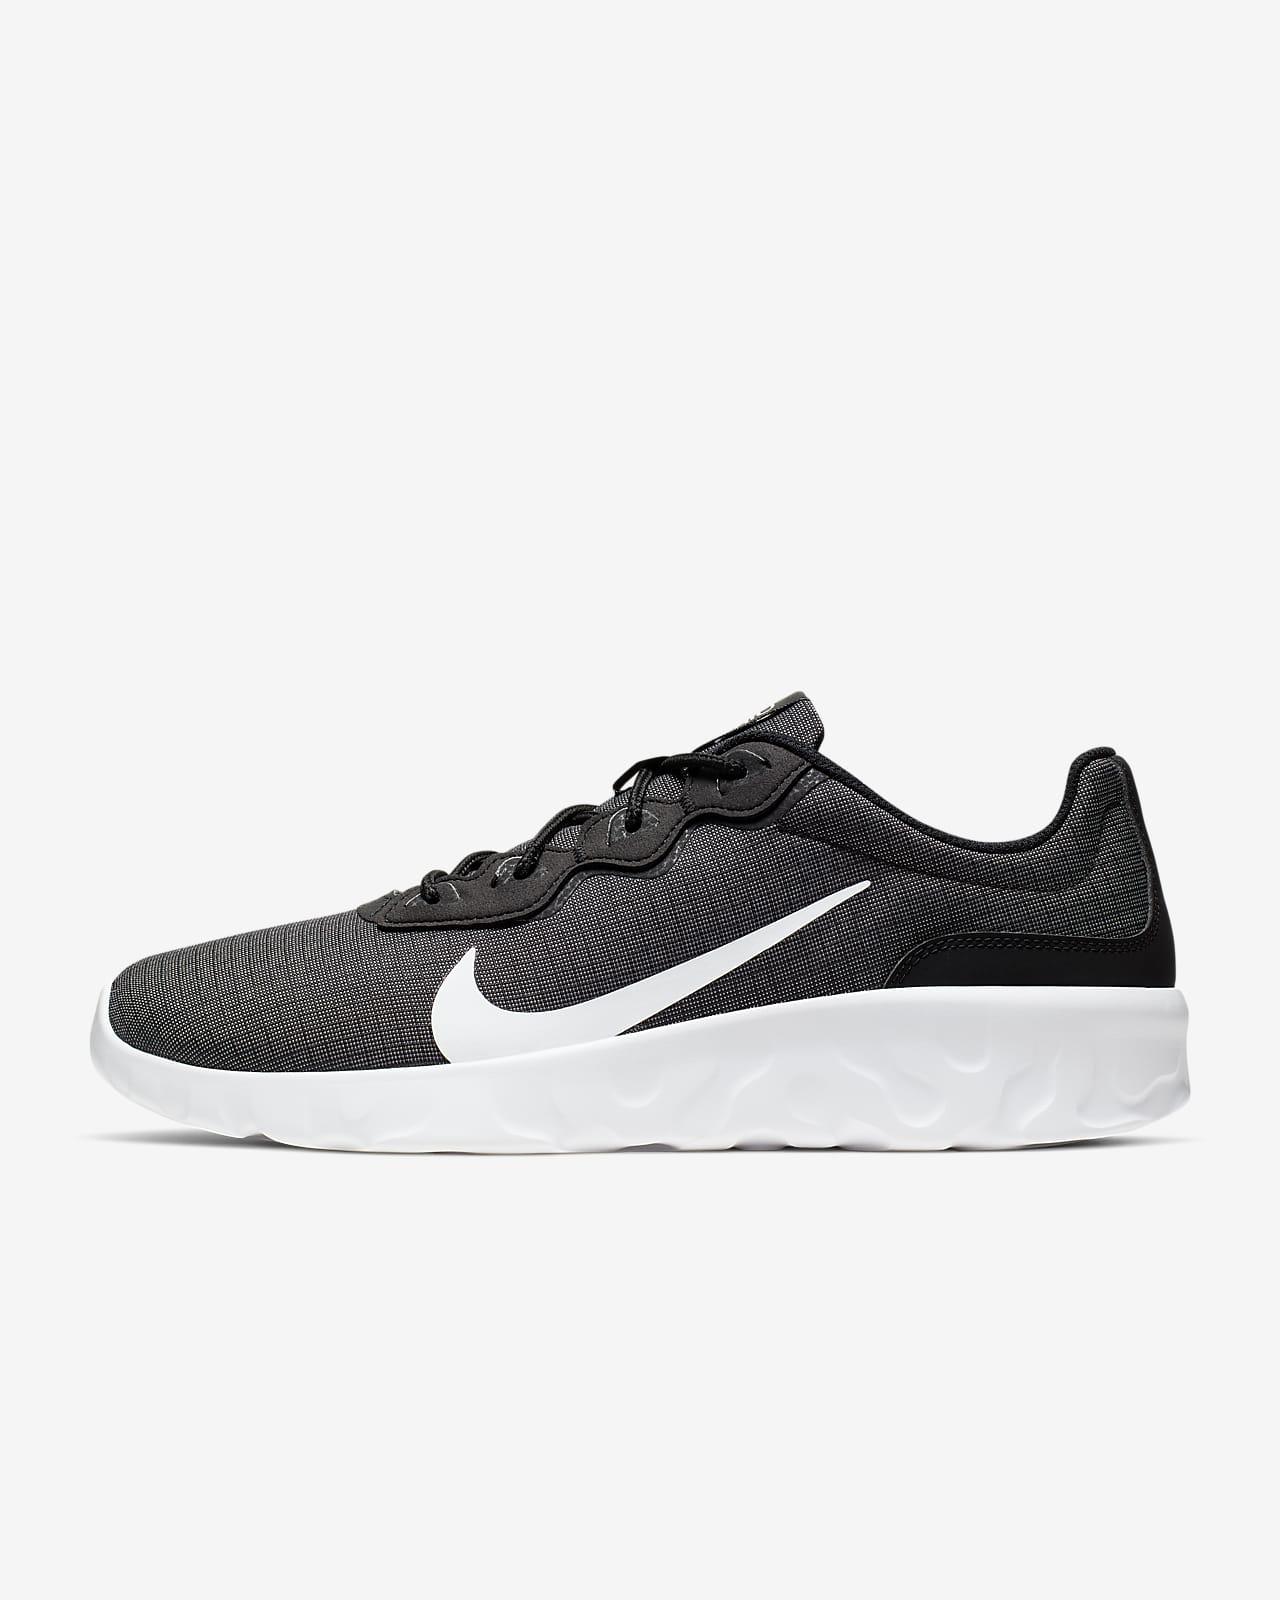 Nike Explore Strada Men's Shoe. Nike LU